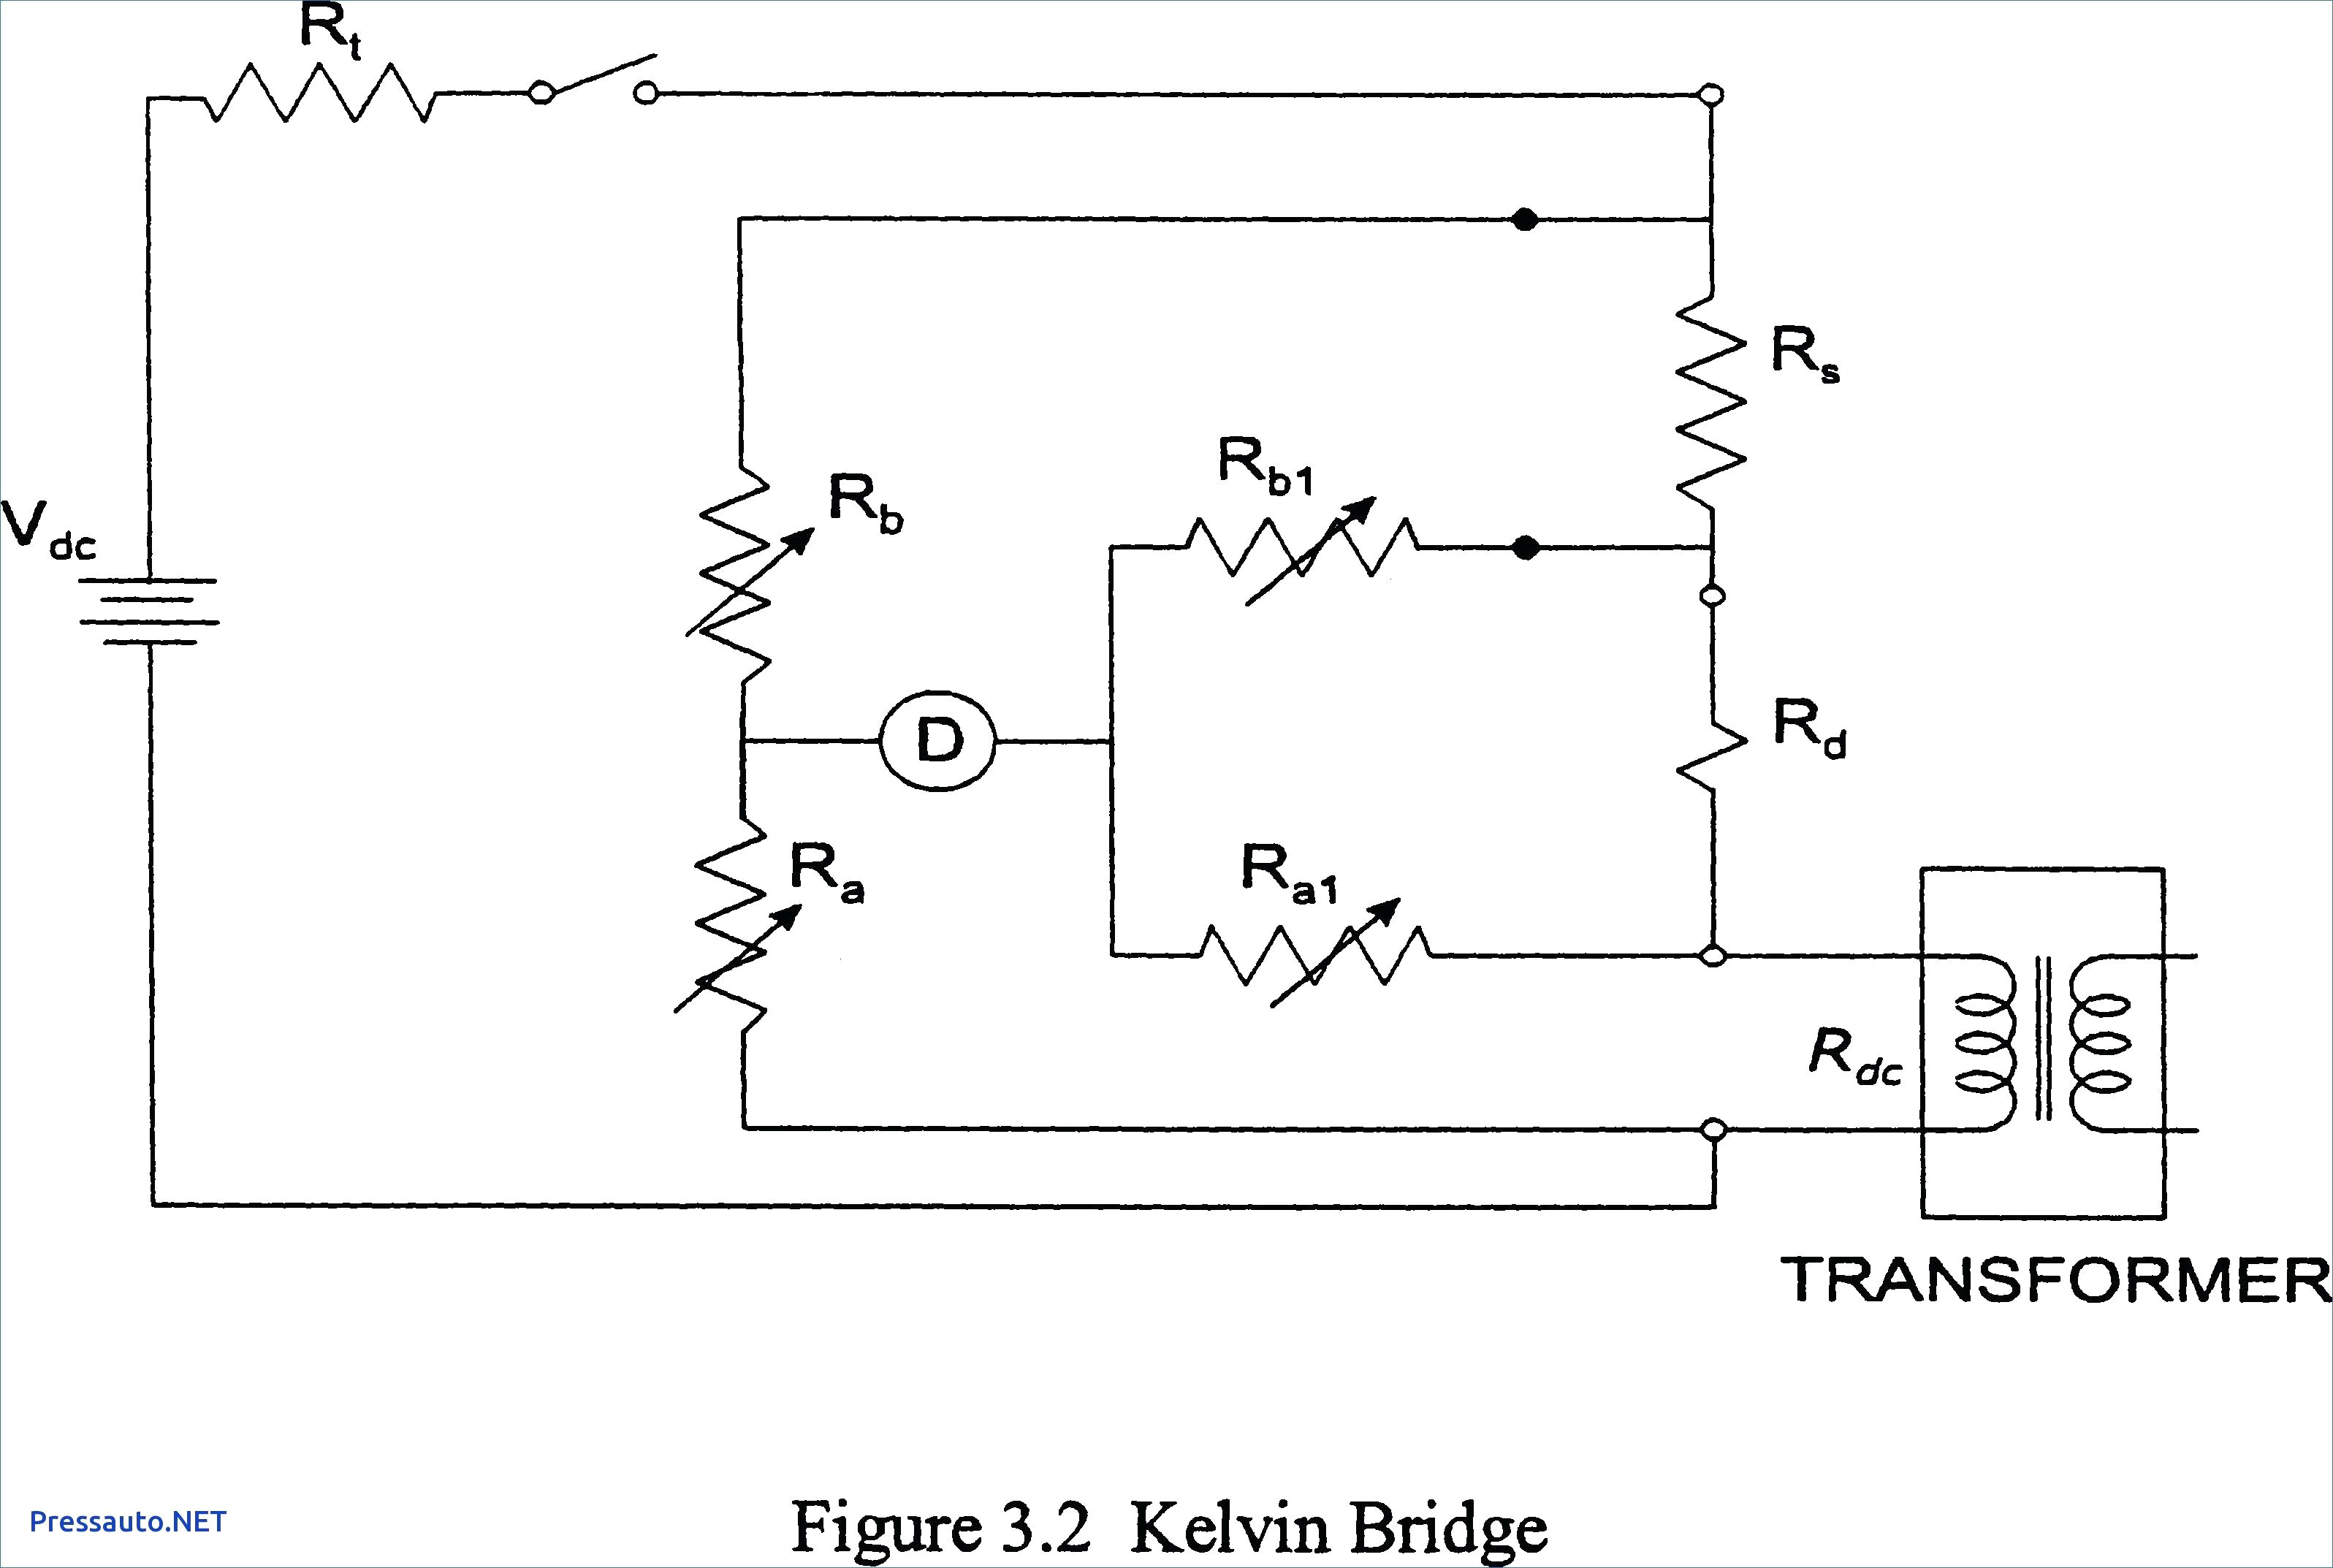 p3 brake controller wiring diagram float level switch jefferson electric transformer sample